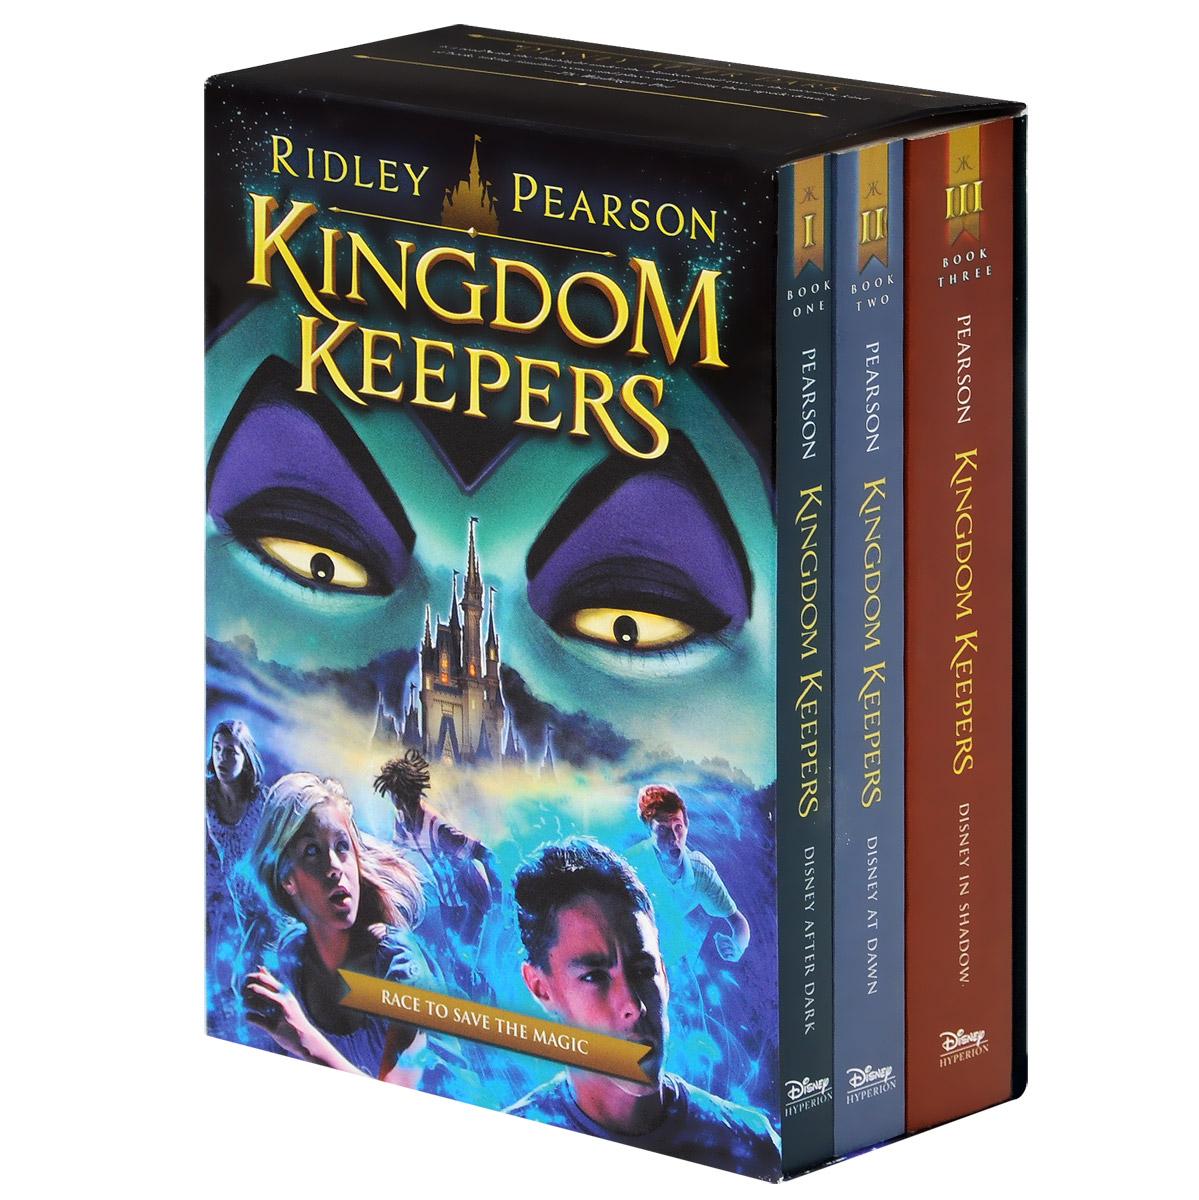 Kingdom Keepers Boxed Set: Featuring Kingdom Keepers